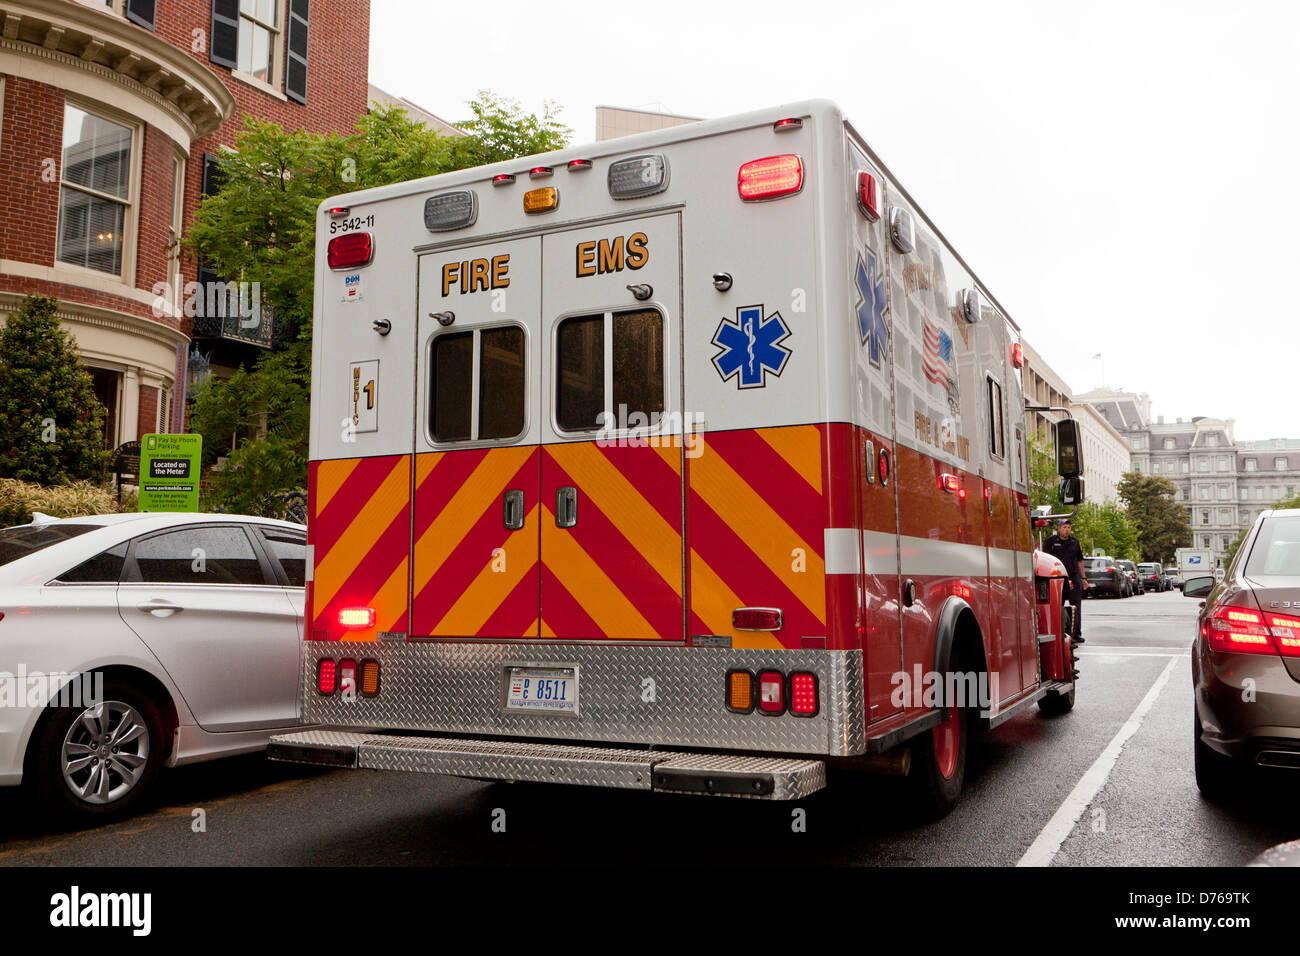 Fire EMS ambulance - Washington, DC USA - Stock Image